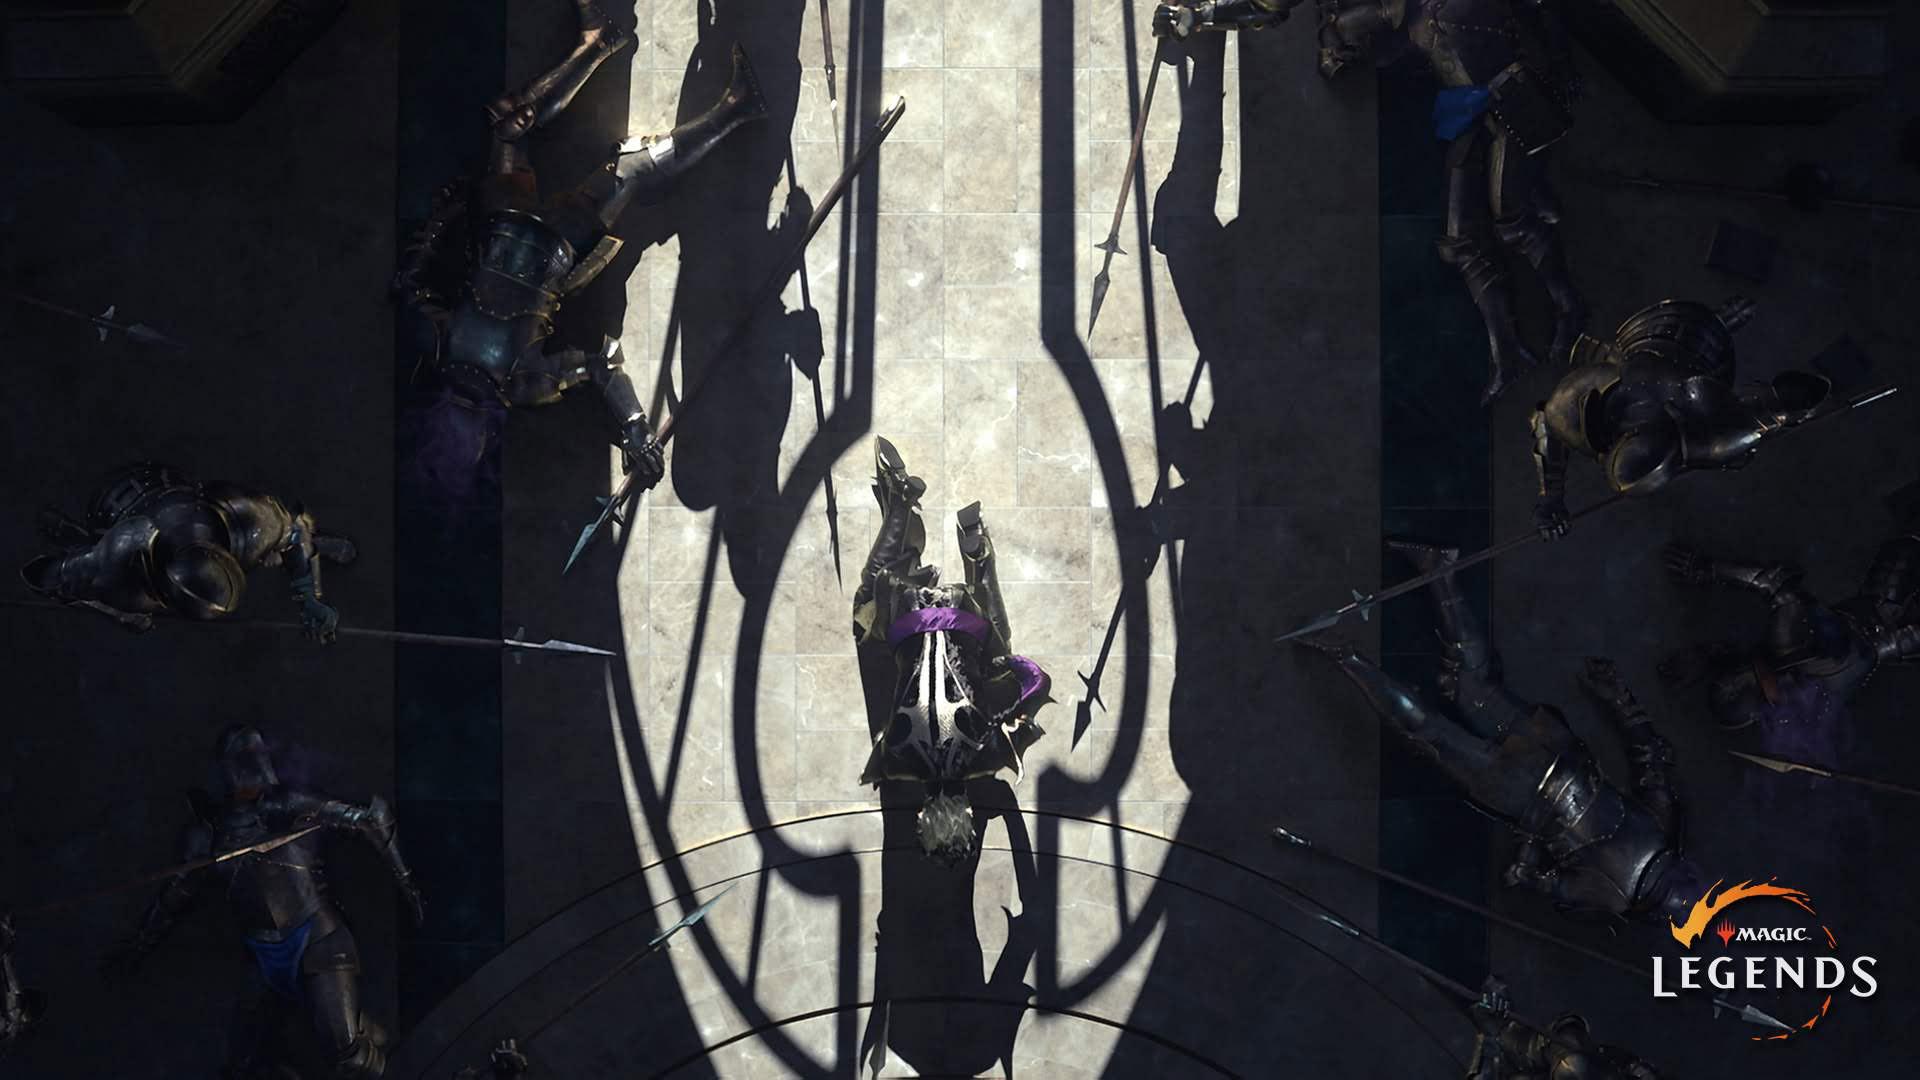 Free Magic: Legends Wallpaper in 1920x1080